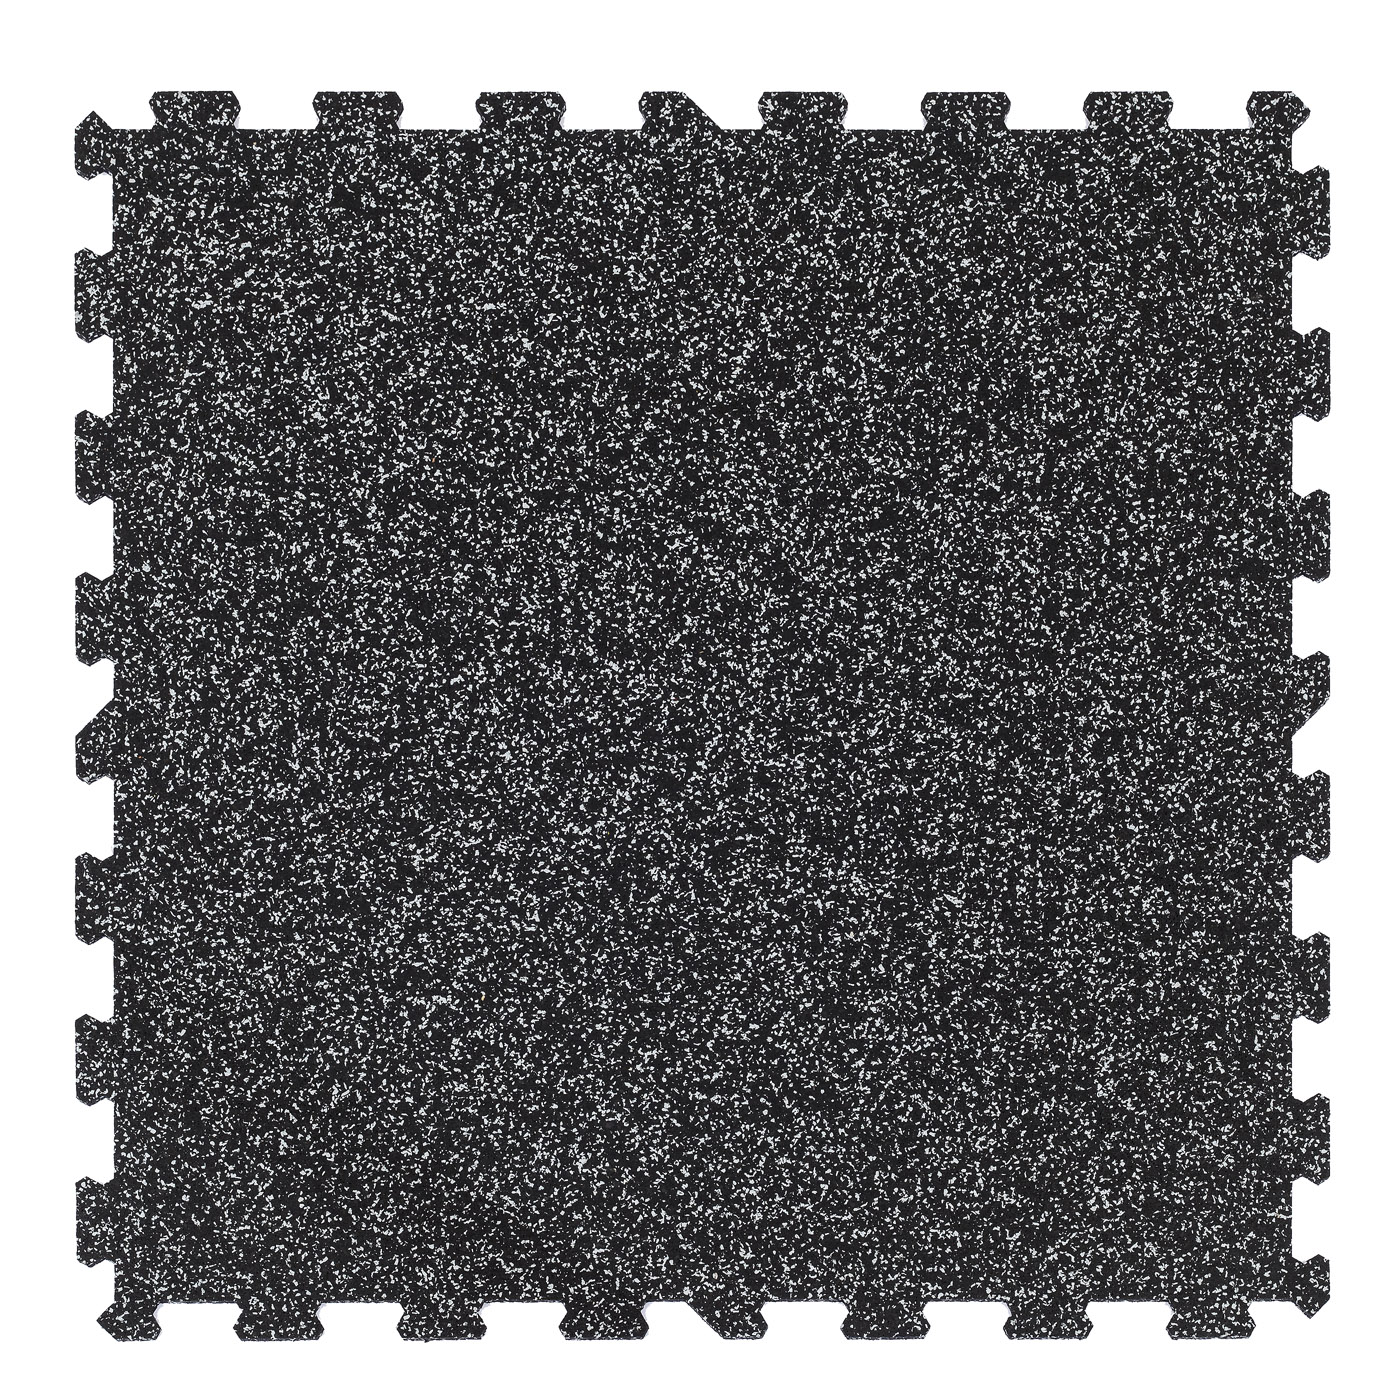 Gumová podlaha PUZZLE - 100 x 100 x 0,8 cm